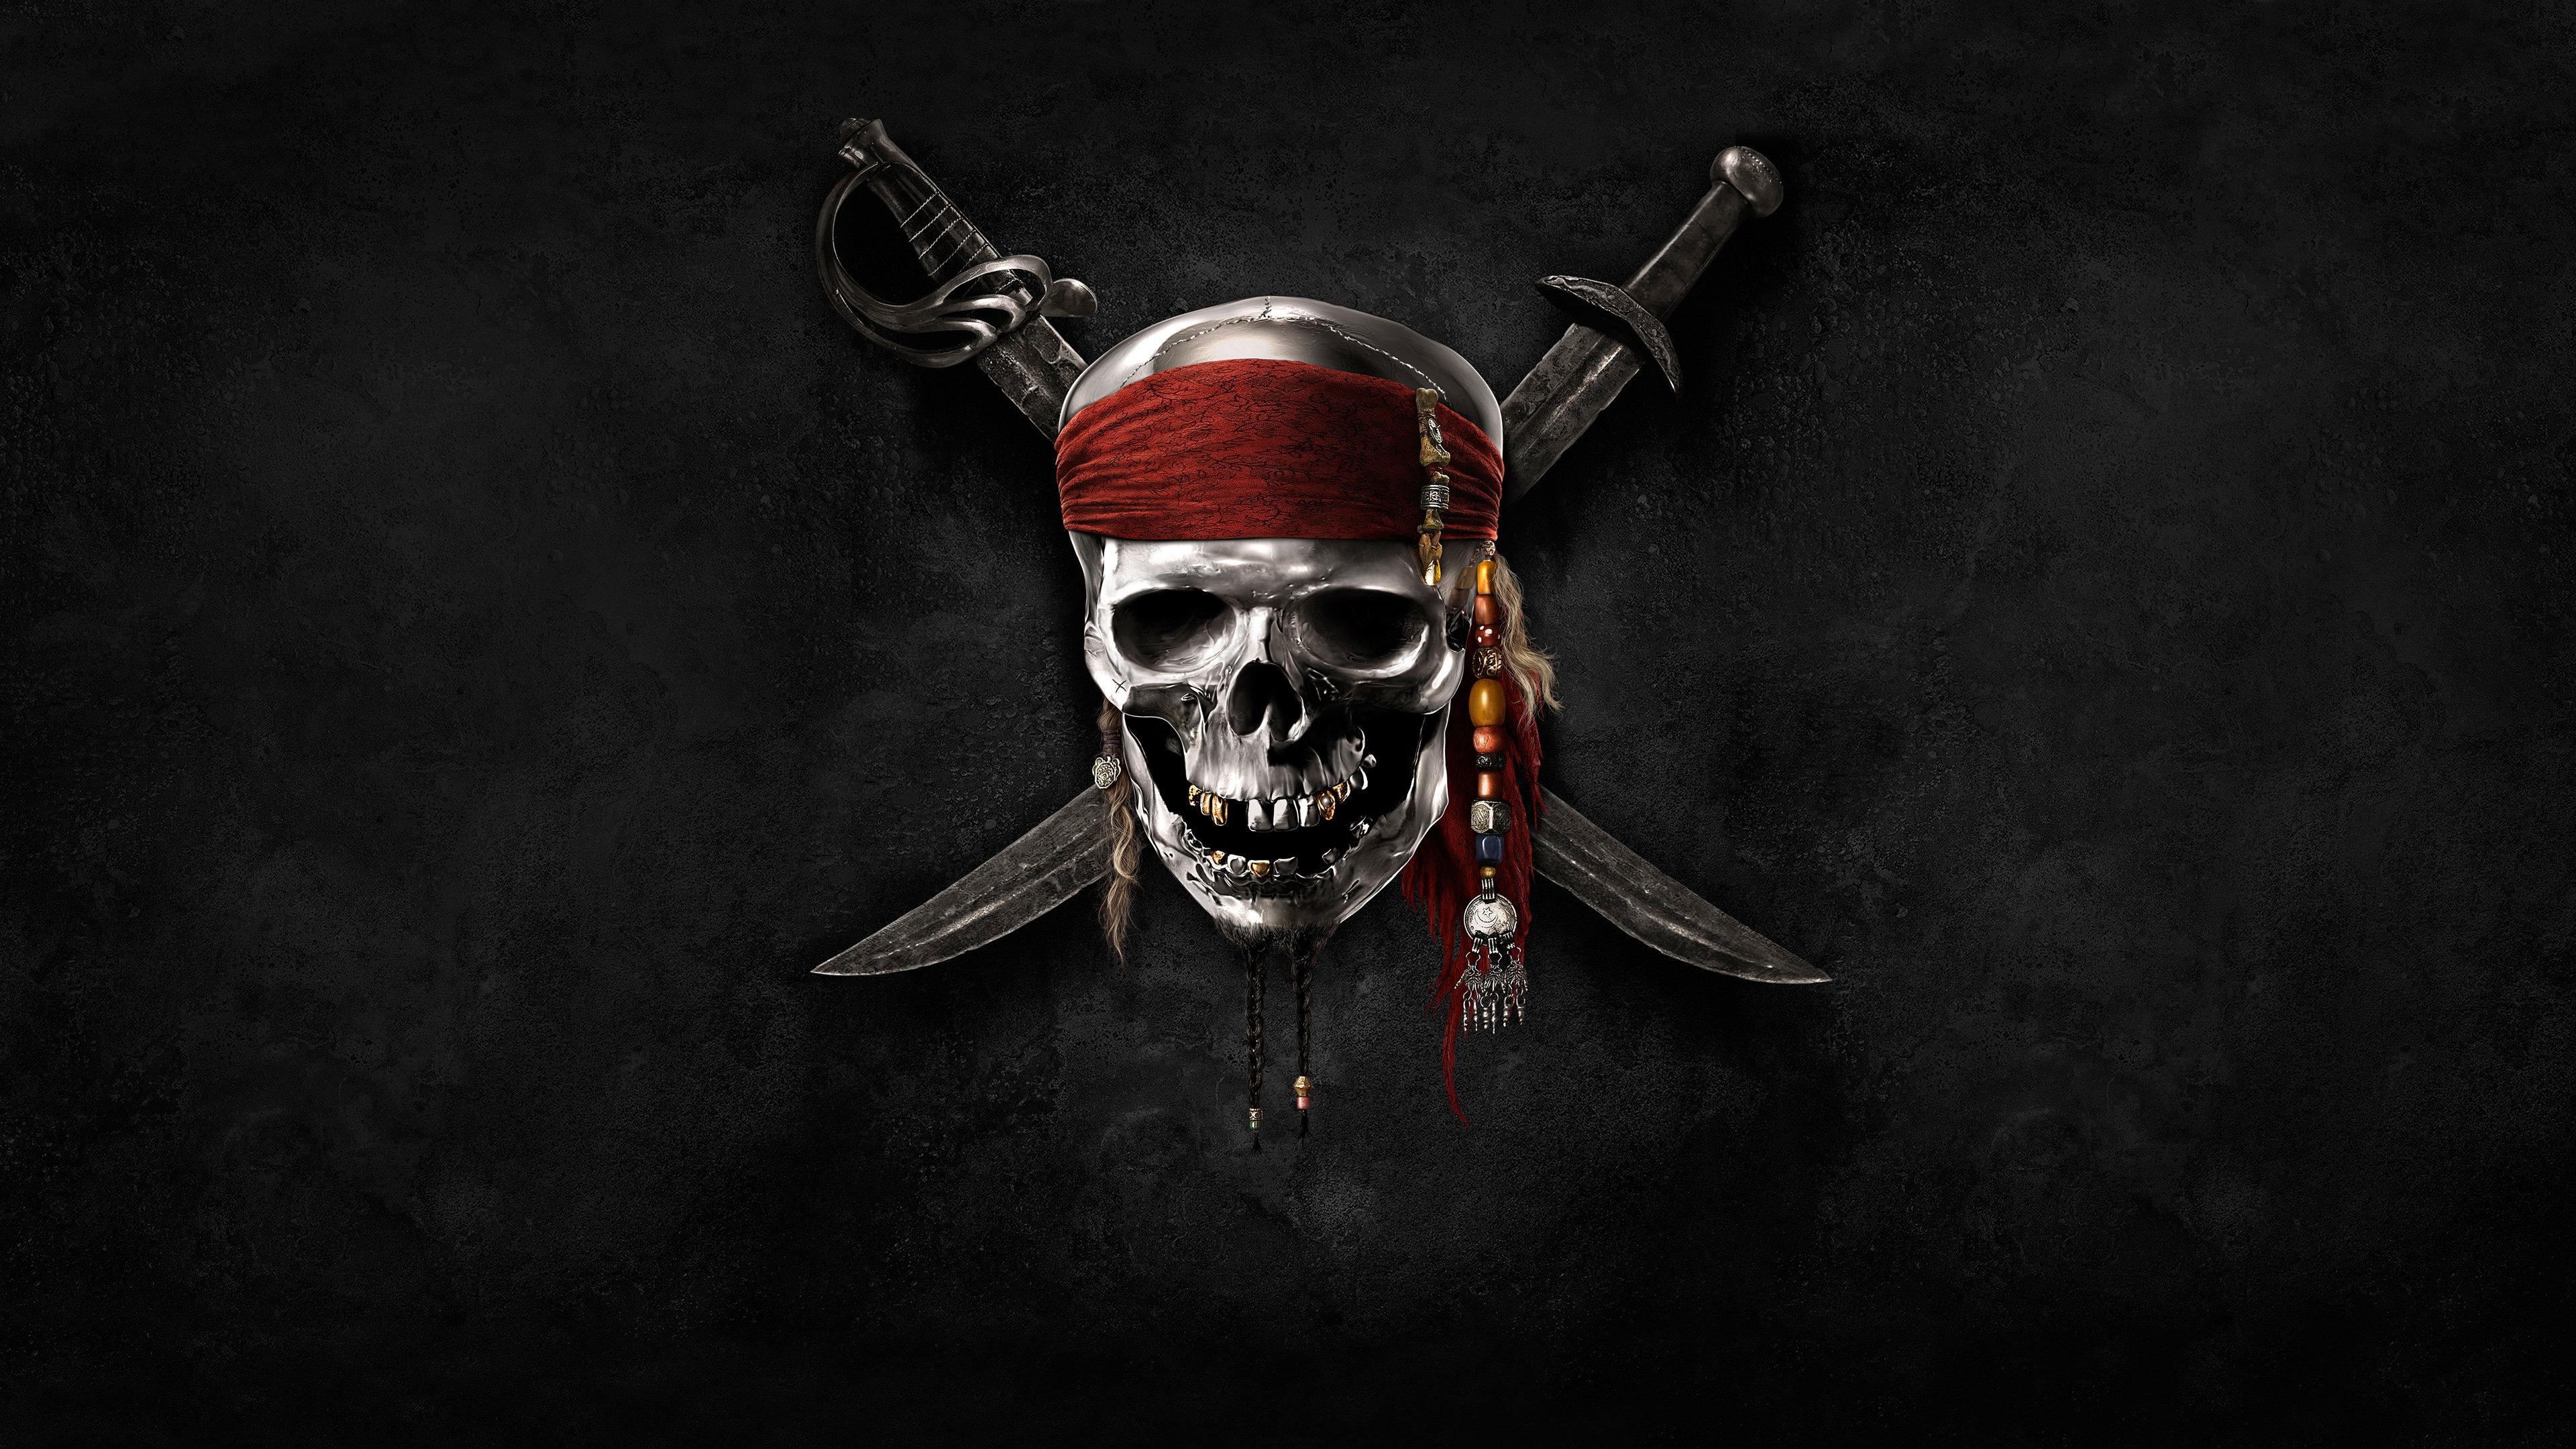 Pirates Of The Caribbean Wallpapers 3840x2160 Ultra Hd 4k Desktop